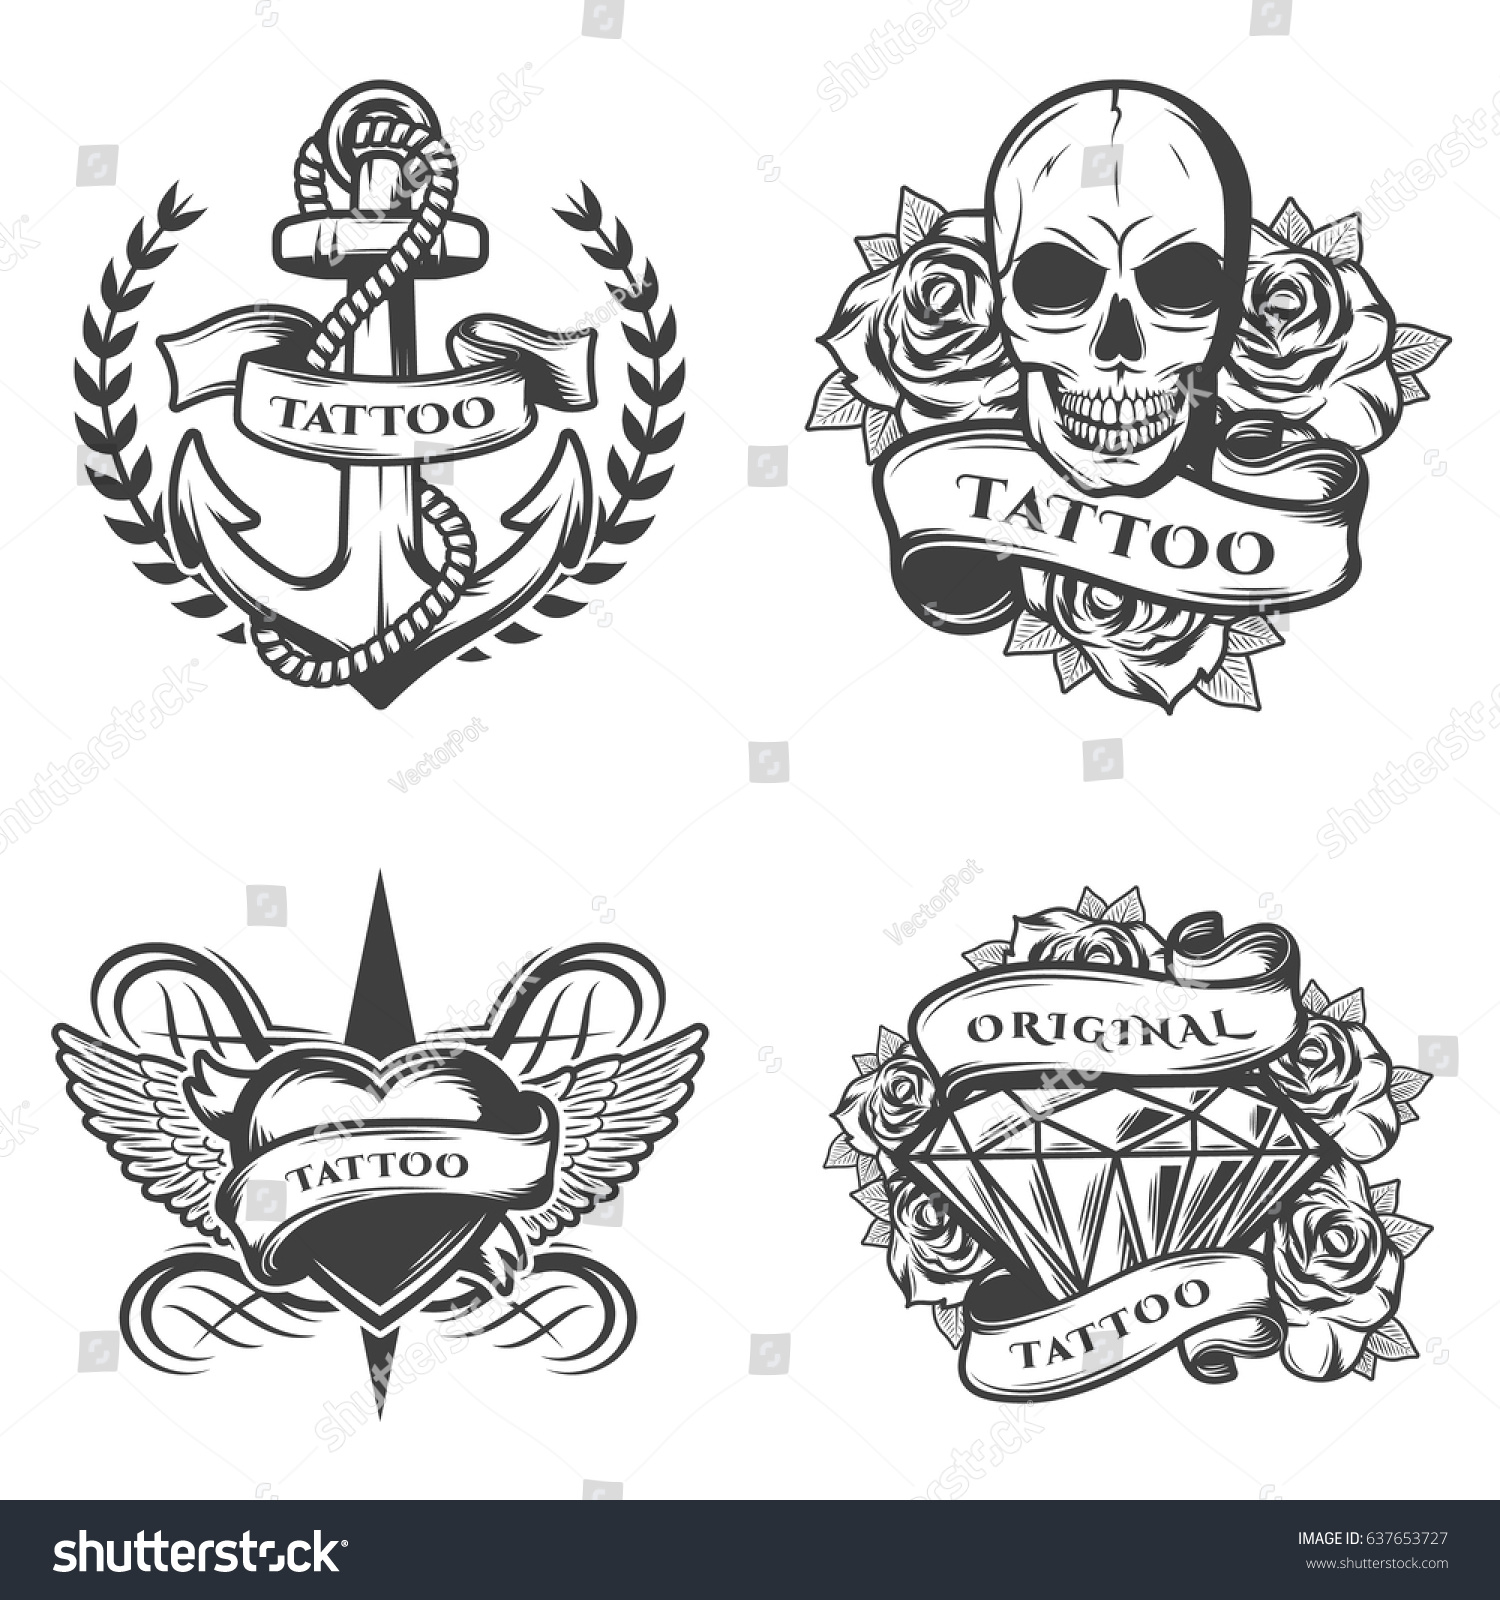 Vintage tattoo studio emblems set anchor stock vector for Vintage tattoo art parlor